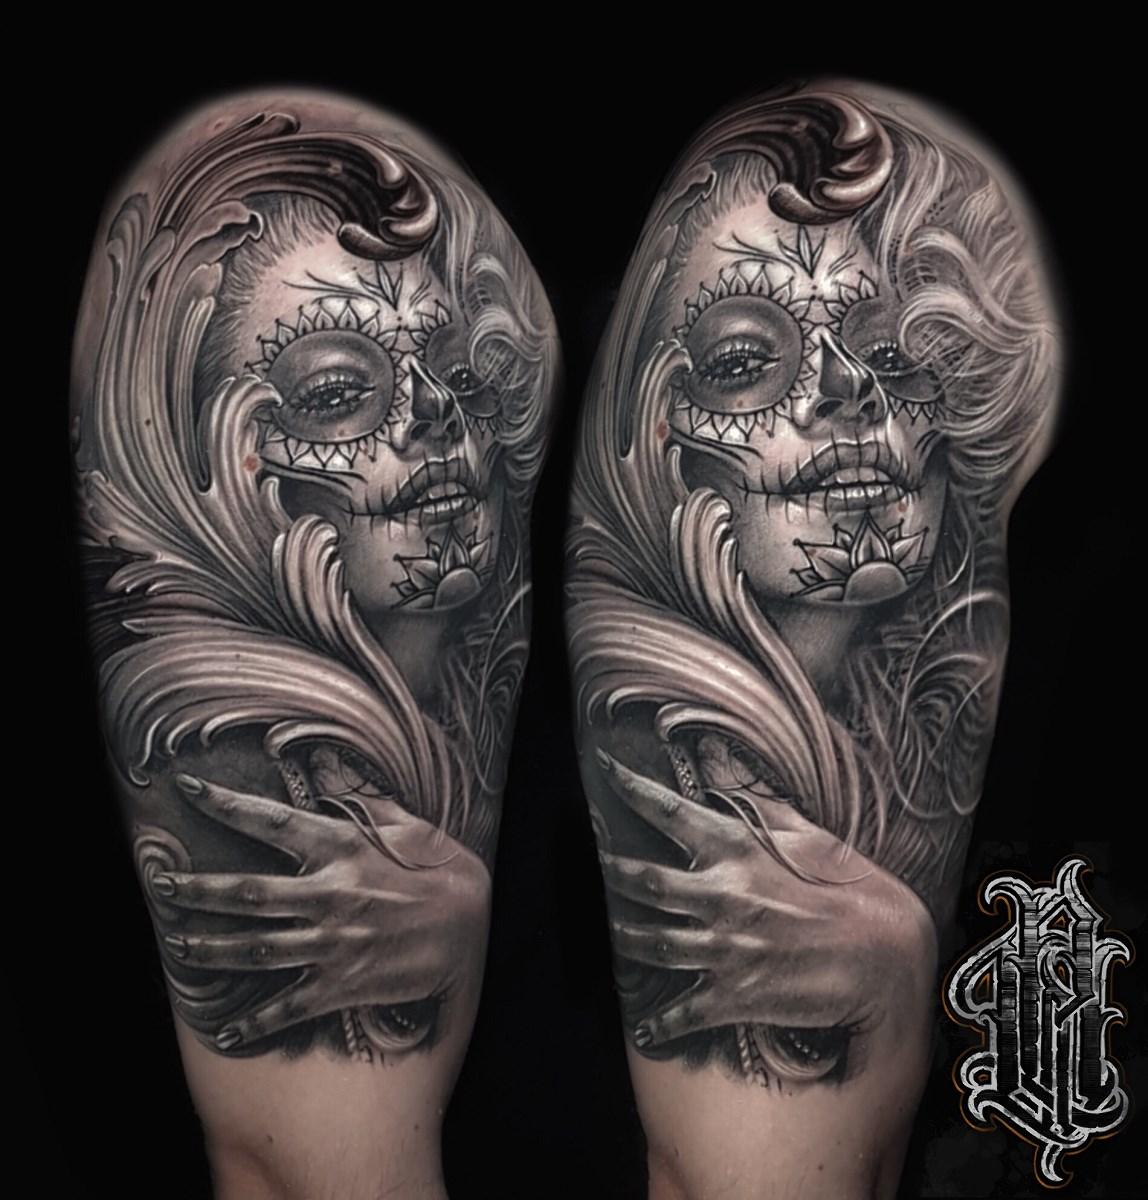 Primo Walasek Biały Kruk Tattoo